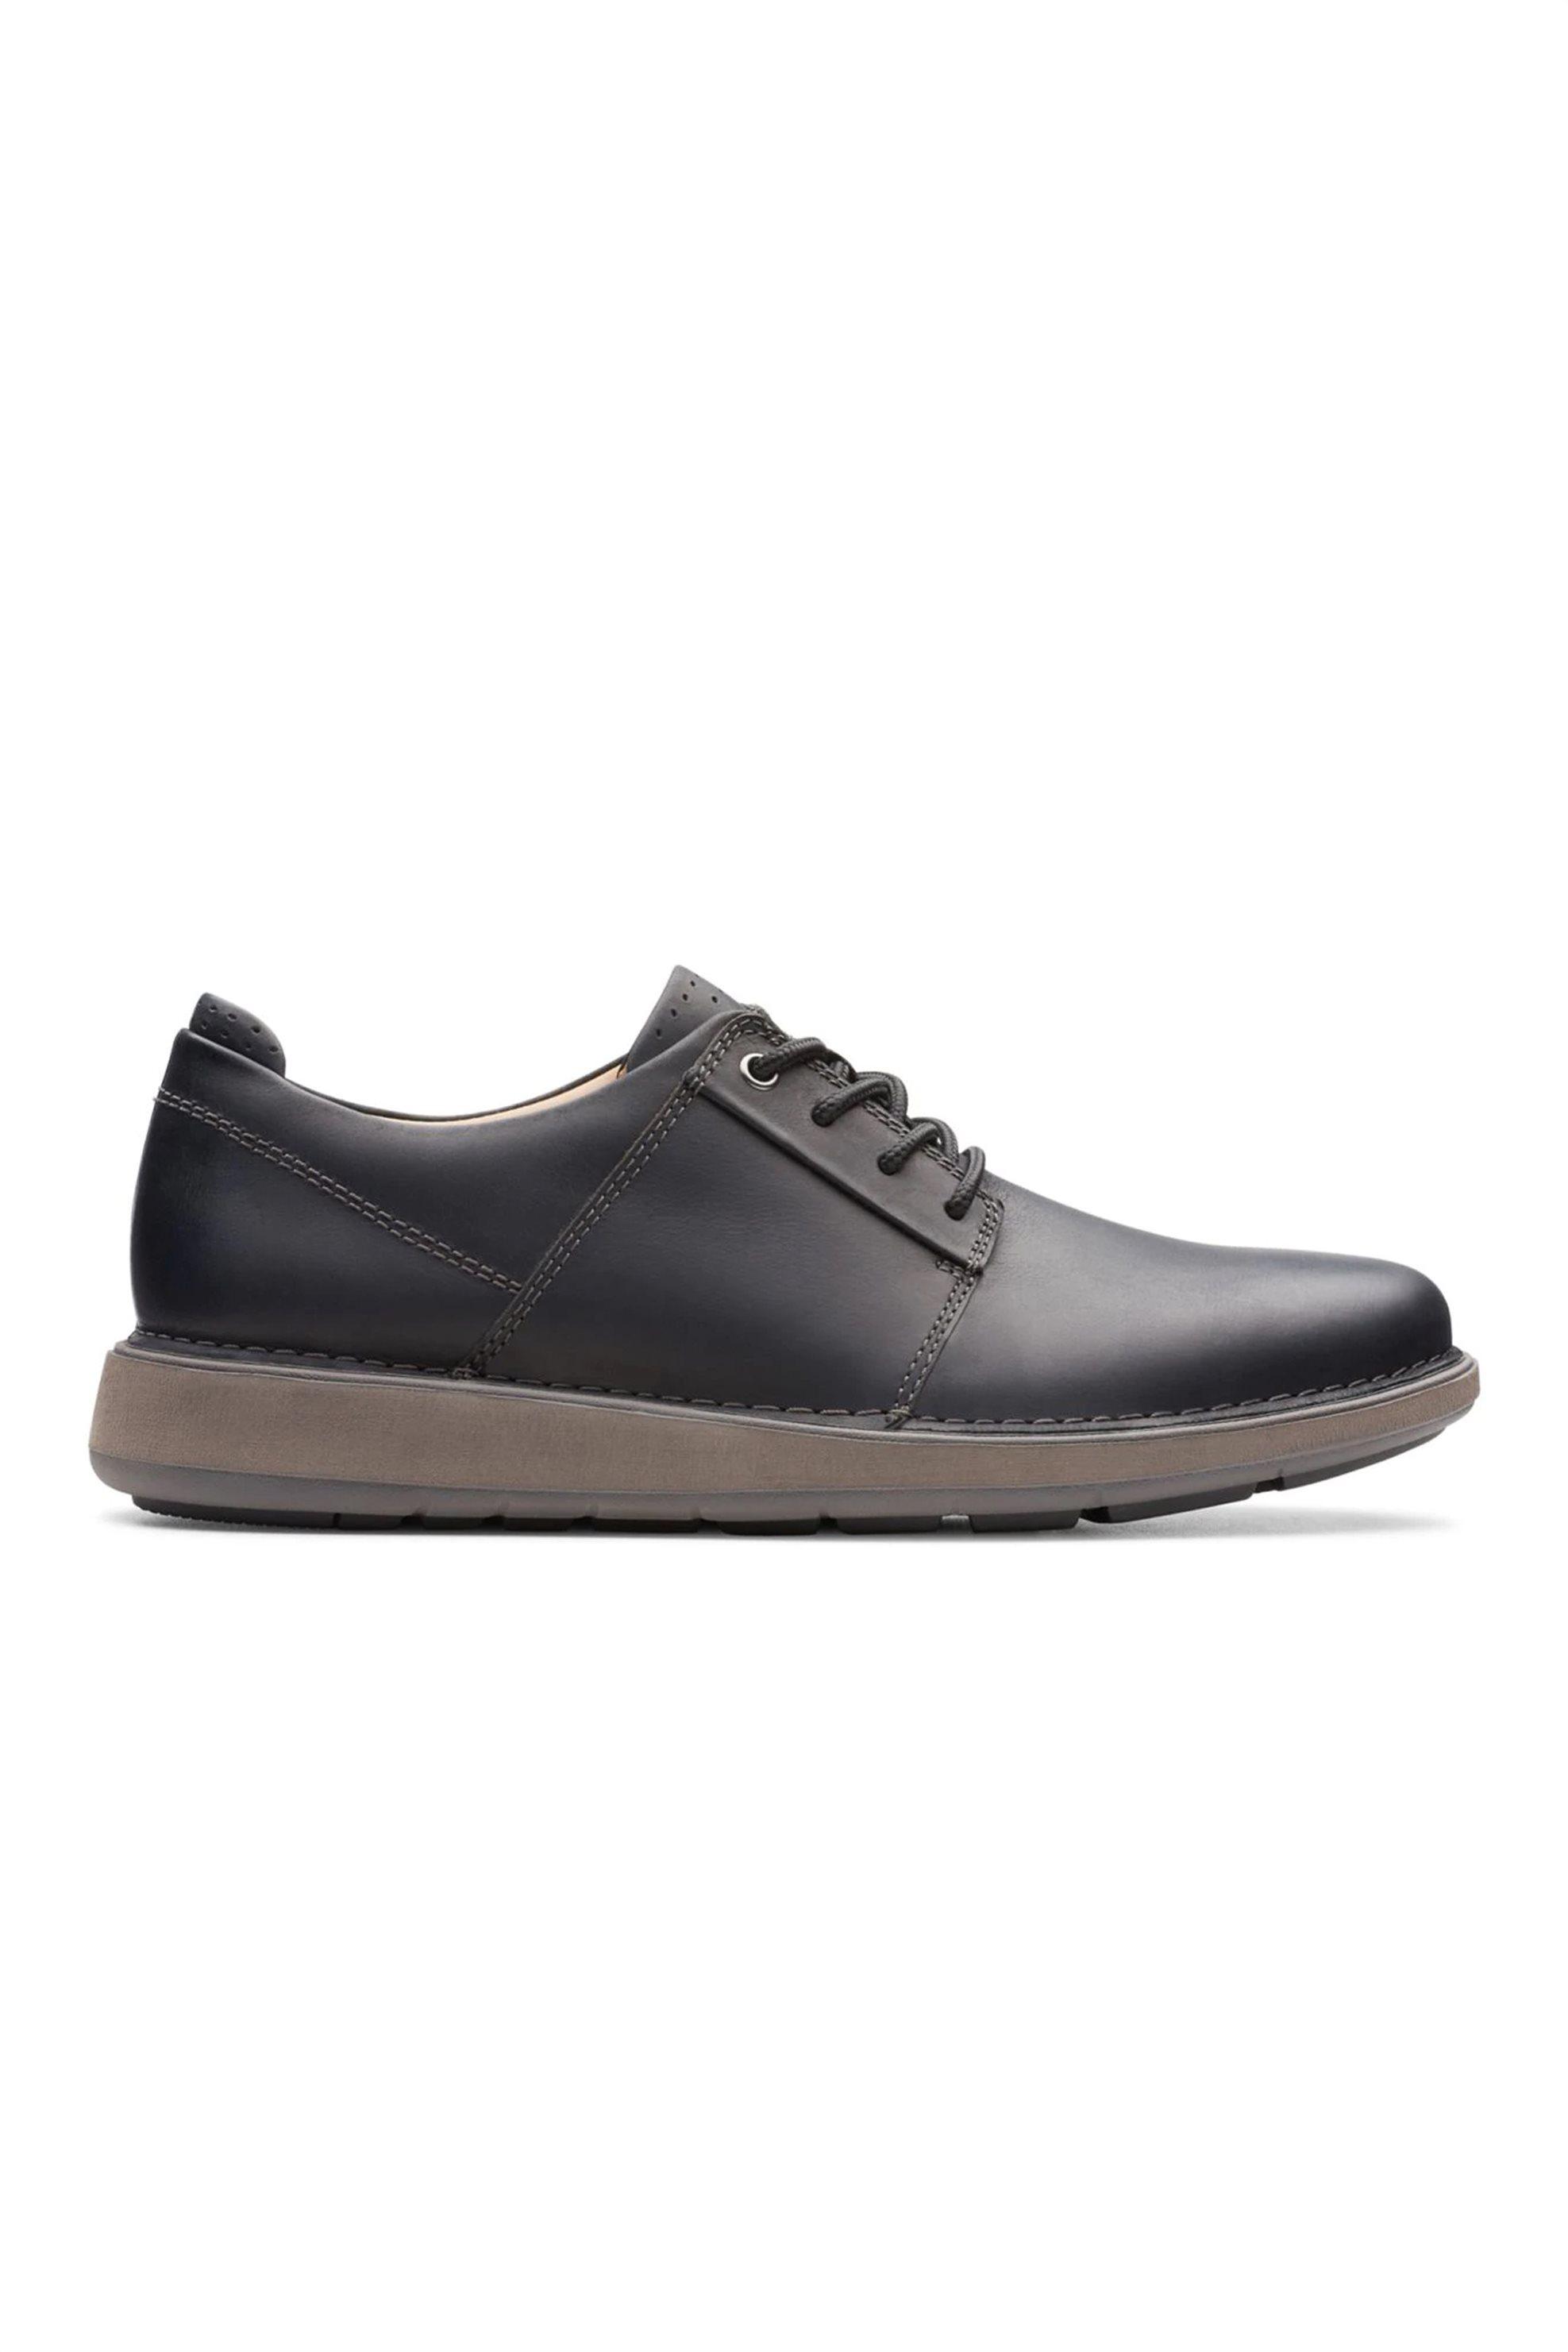 Clarks ανδρικά casual παπούτσια με κορδόνια «Un Larvik Lace» – 26144577 – Μαύρο